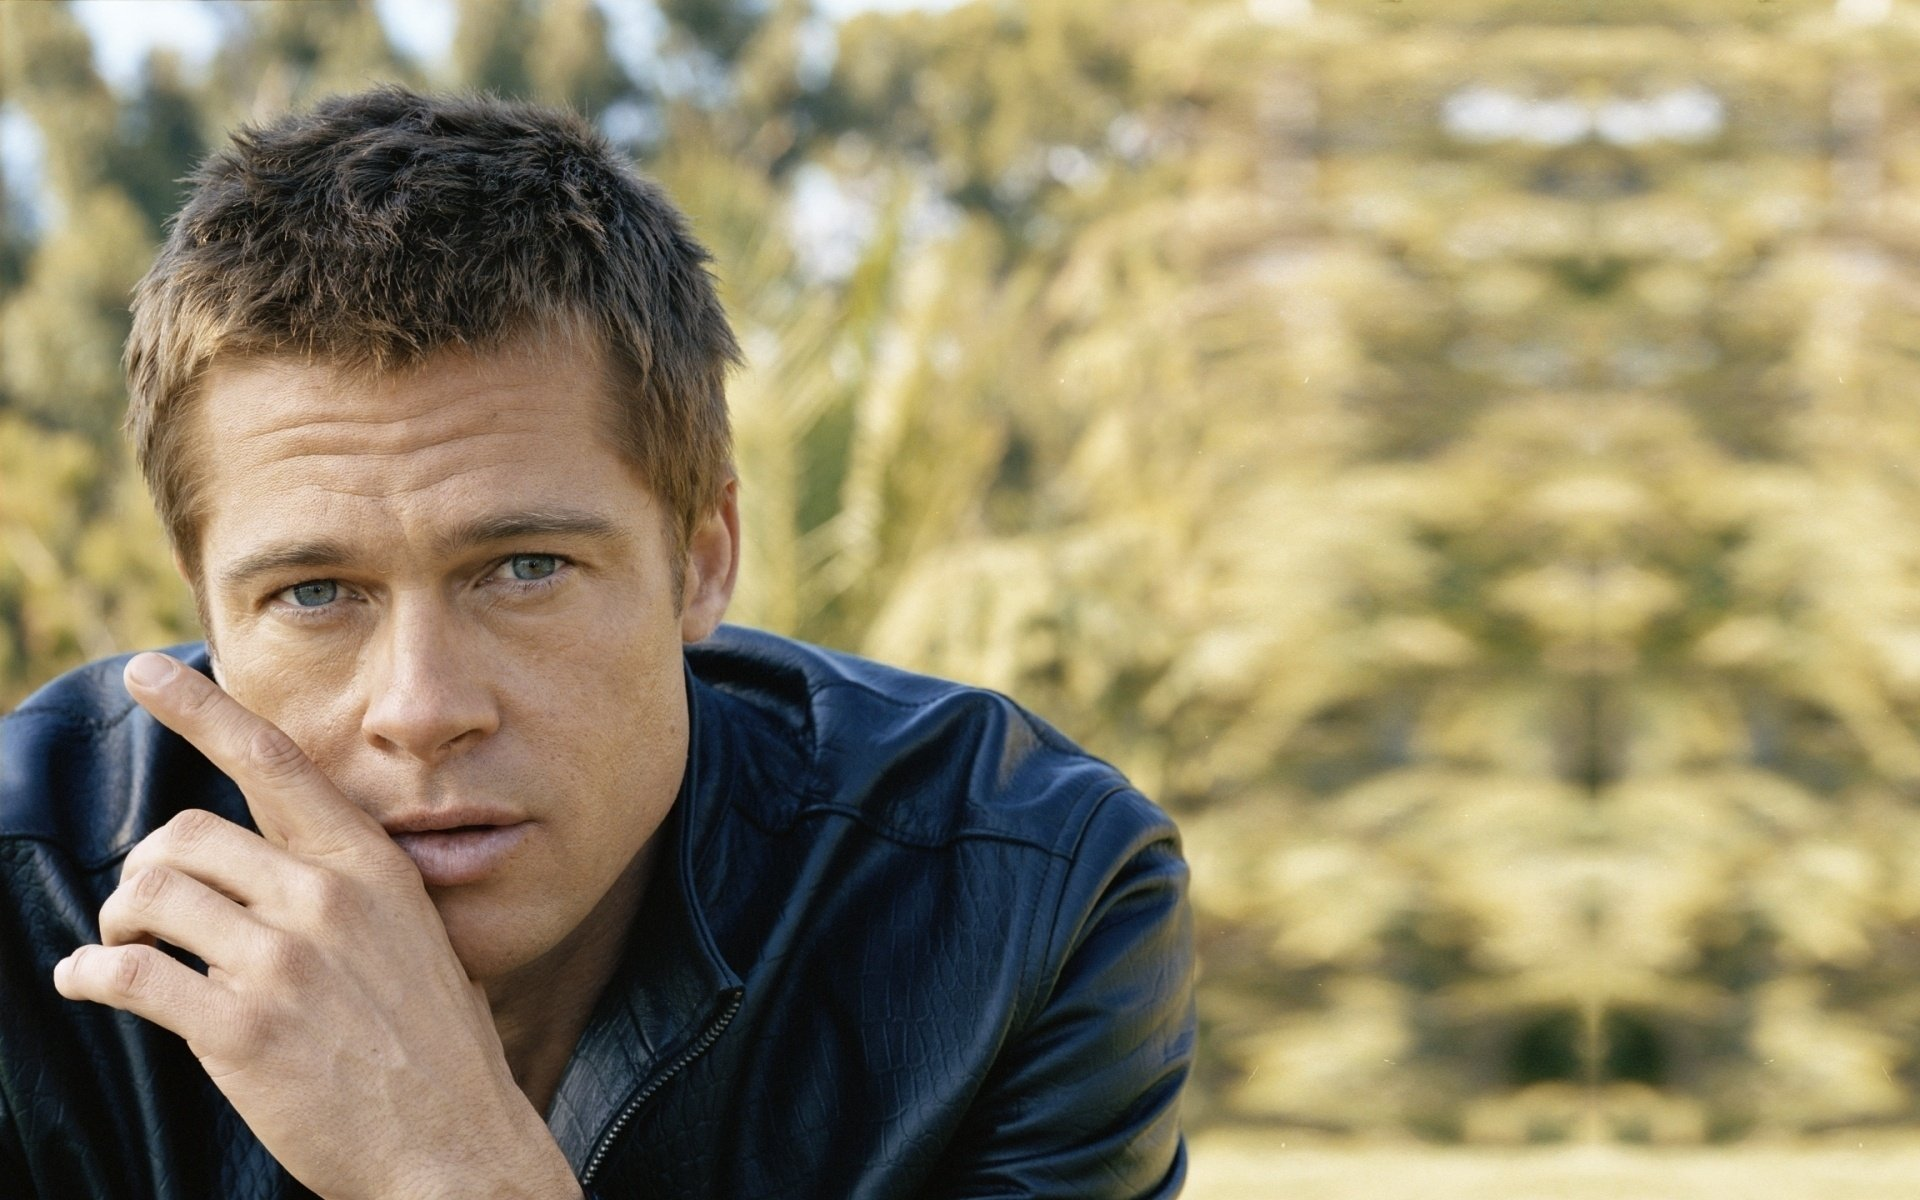 Brad Pitt Hd Wallpapers: Brad Pitt Full HD Wallpaper And Background Image